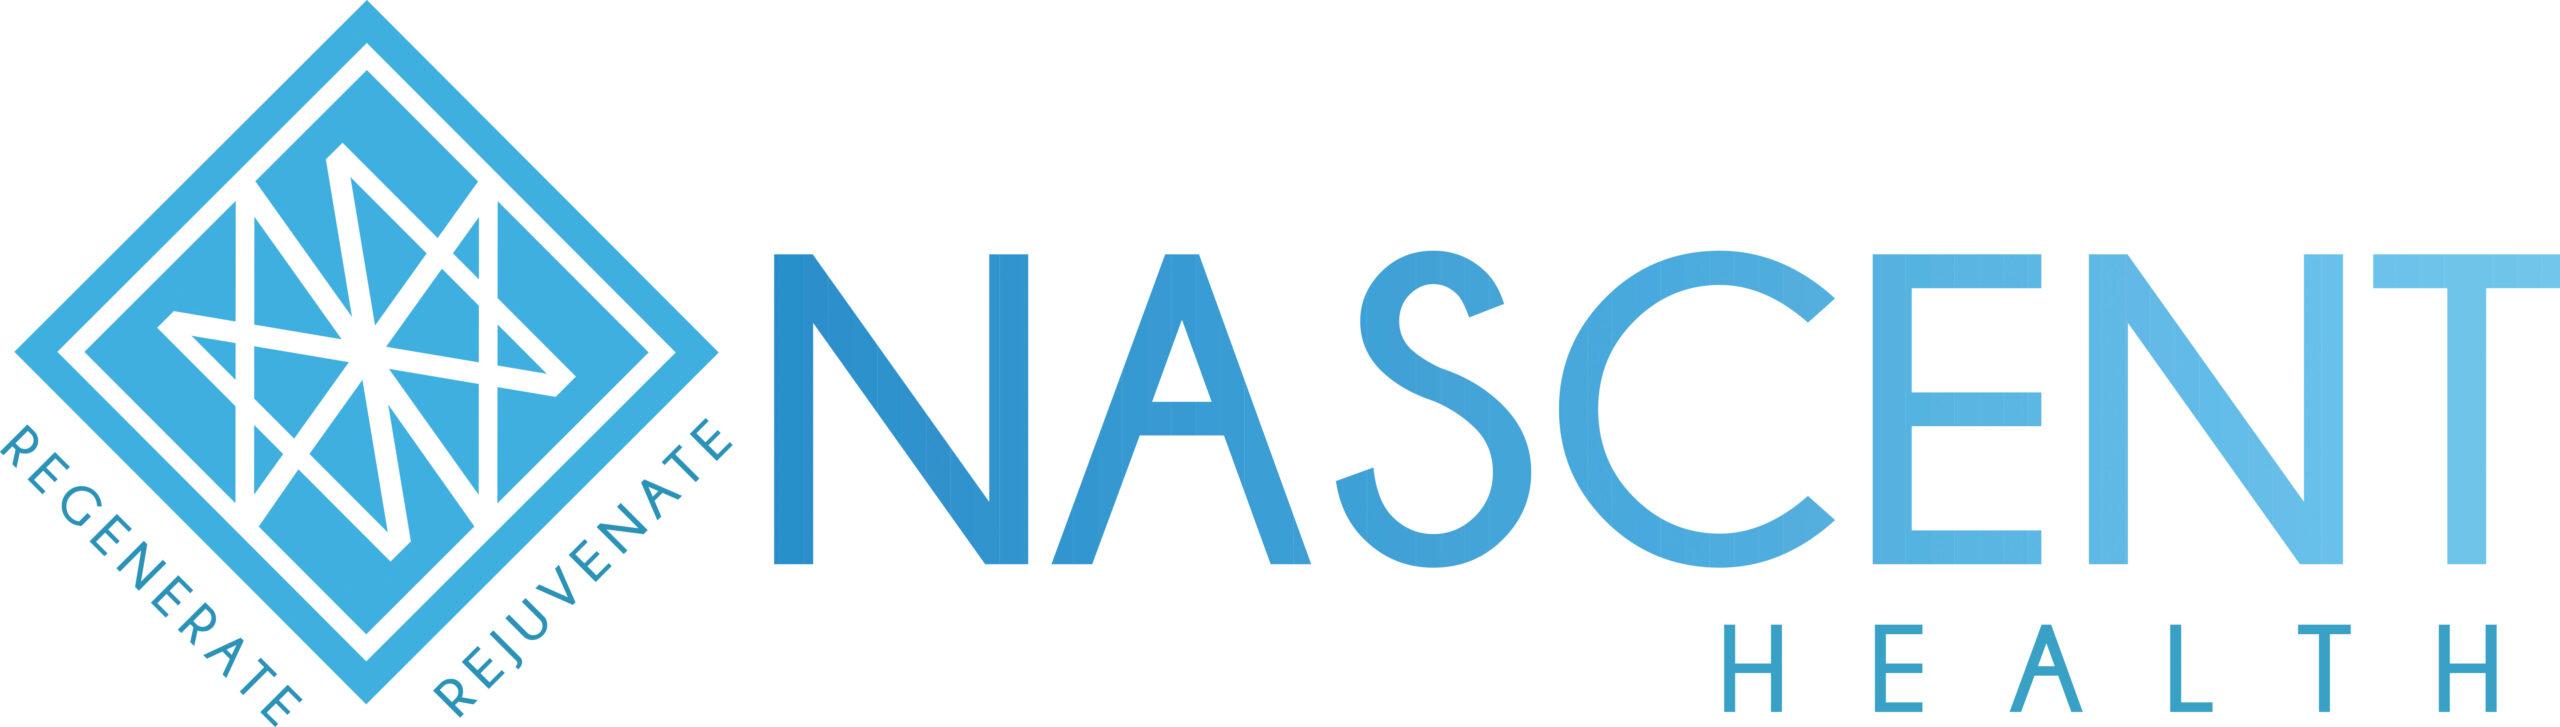 nascent health logo